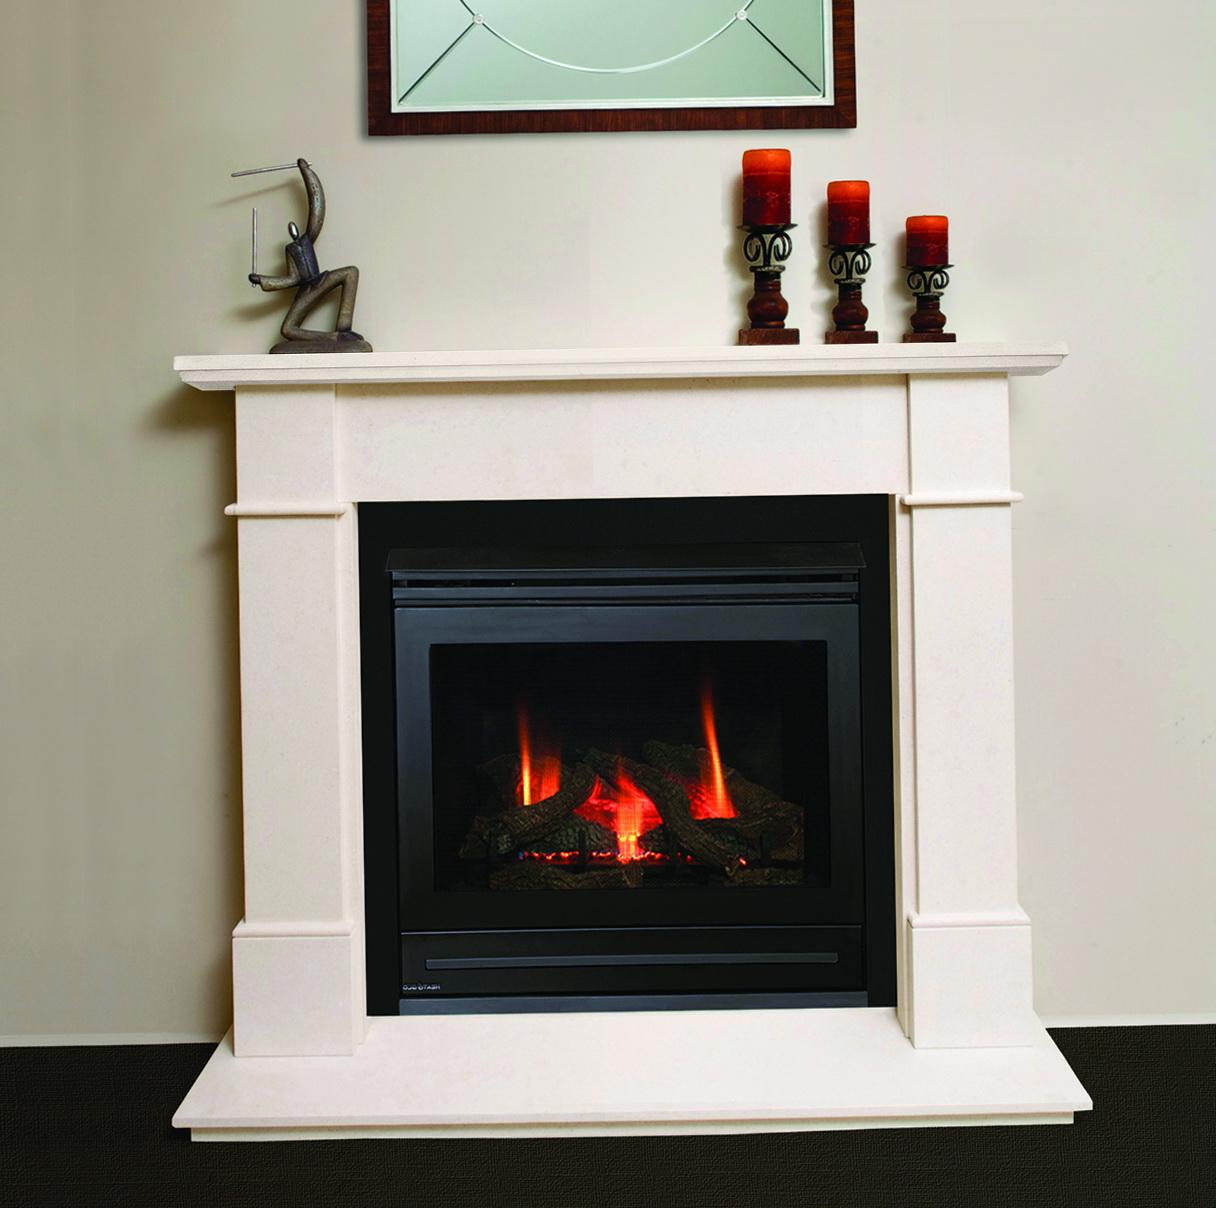 Electrical Home Design Ideas: Heat Surge Electric Fireplace Adl 2000m X